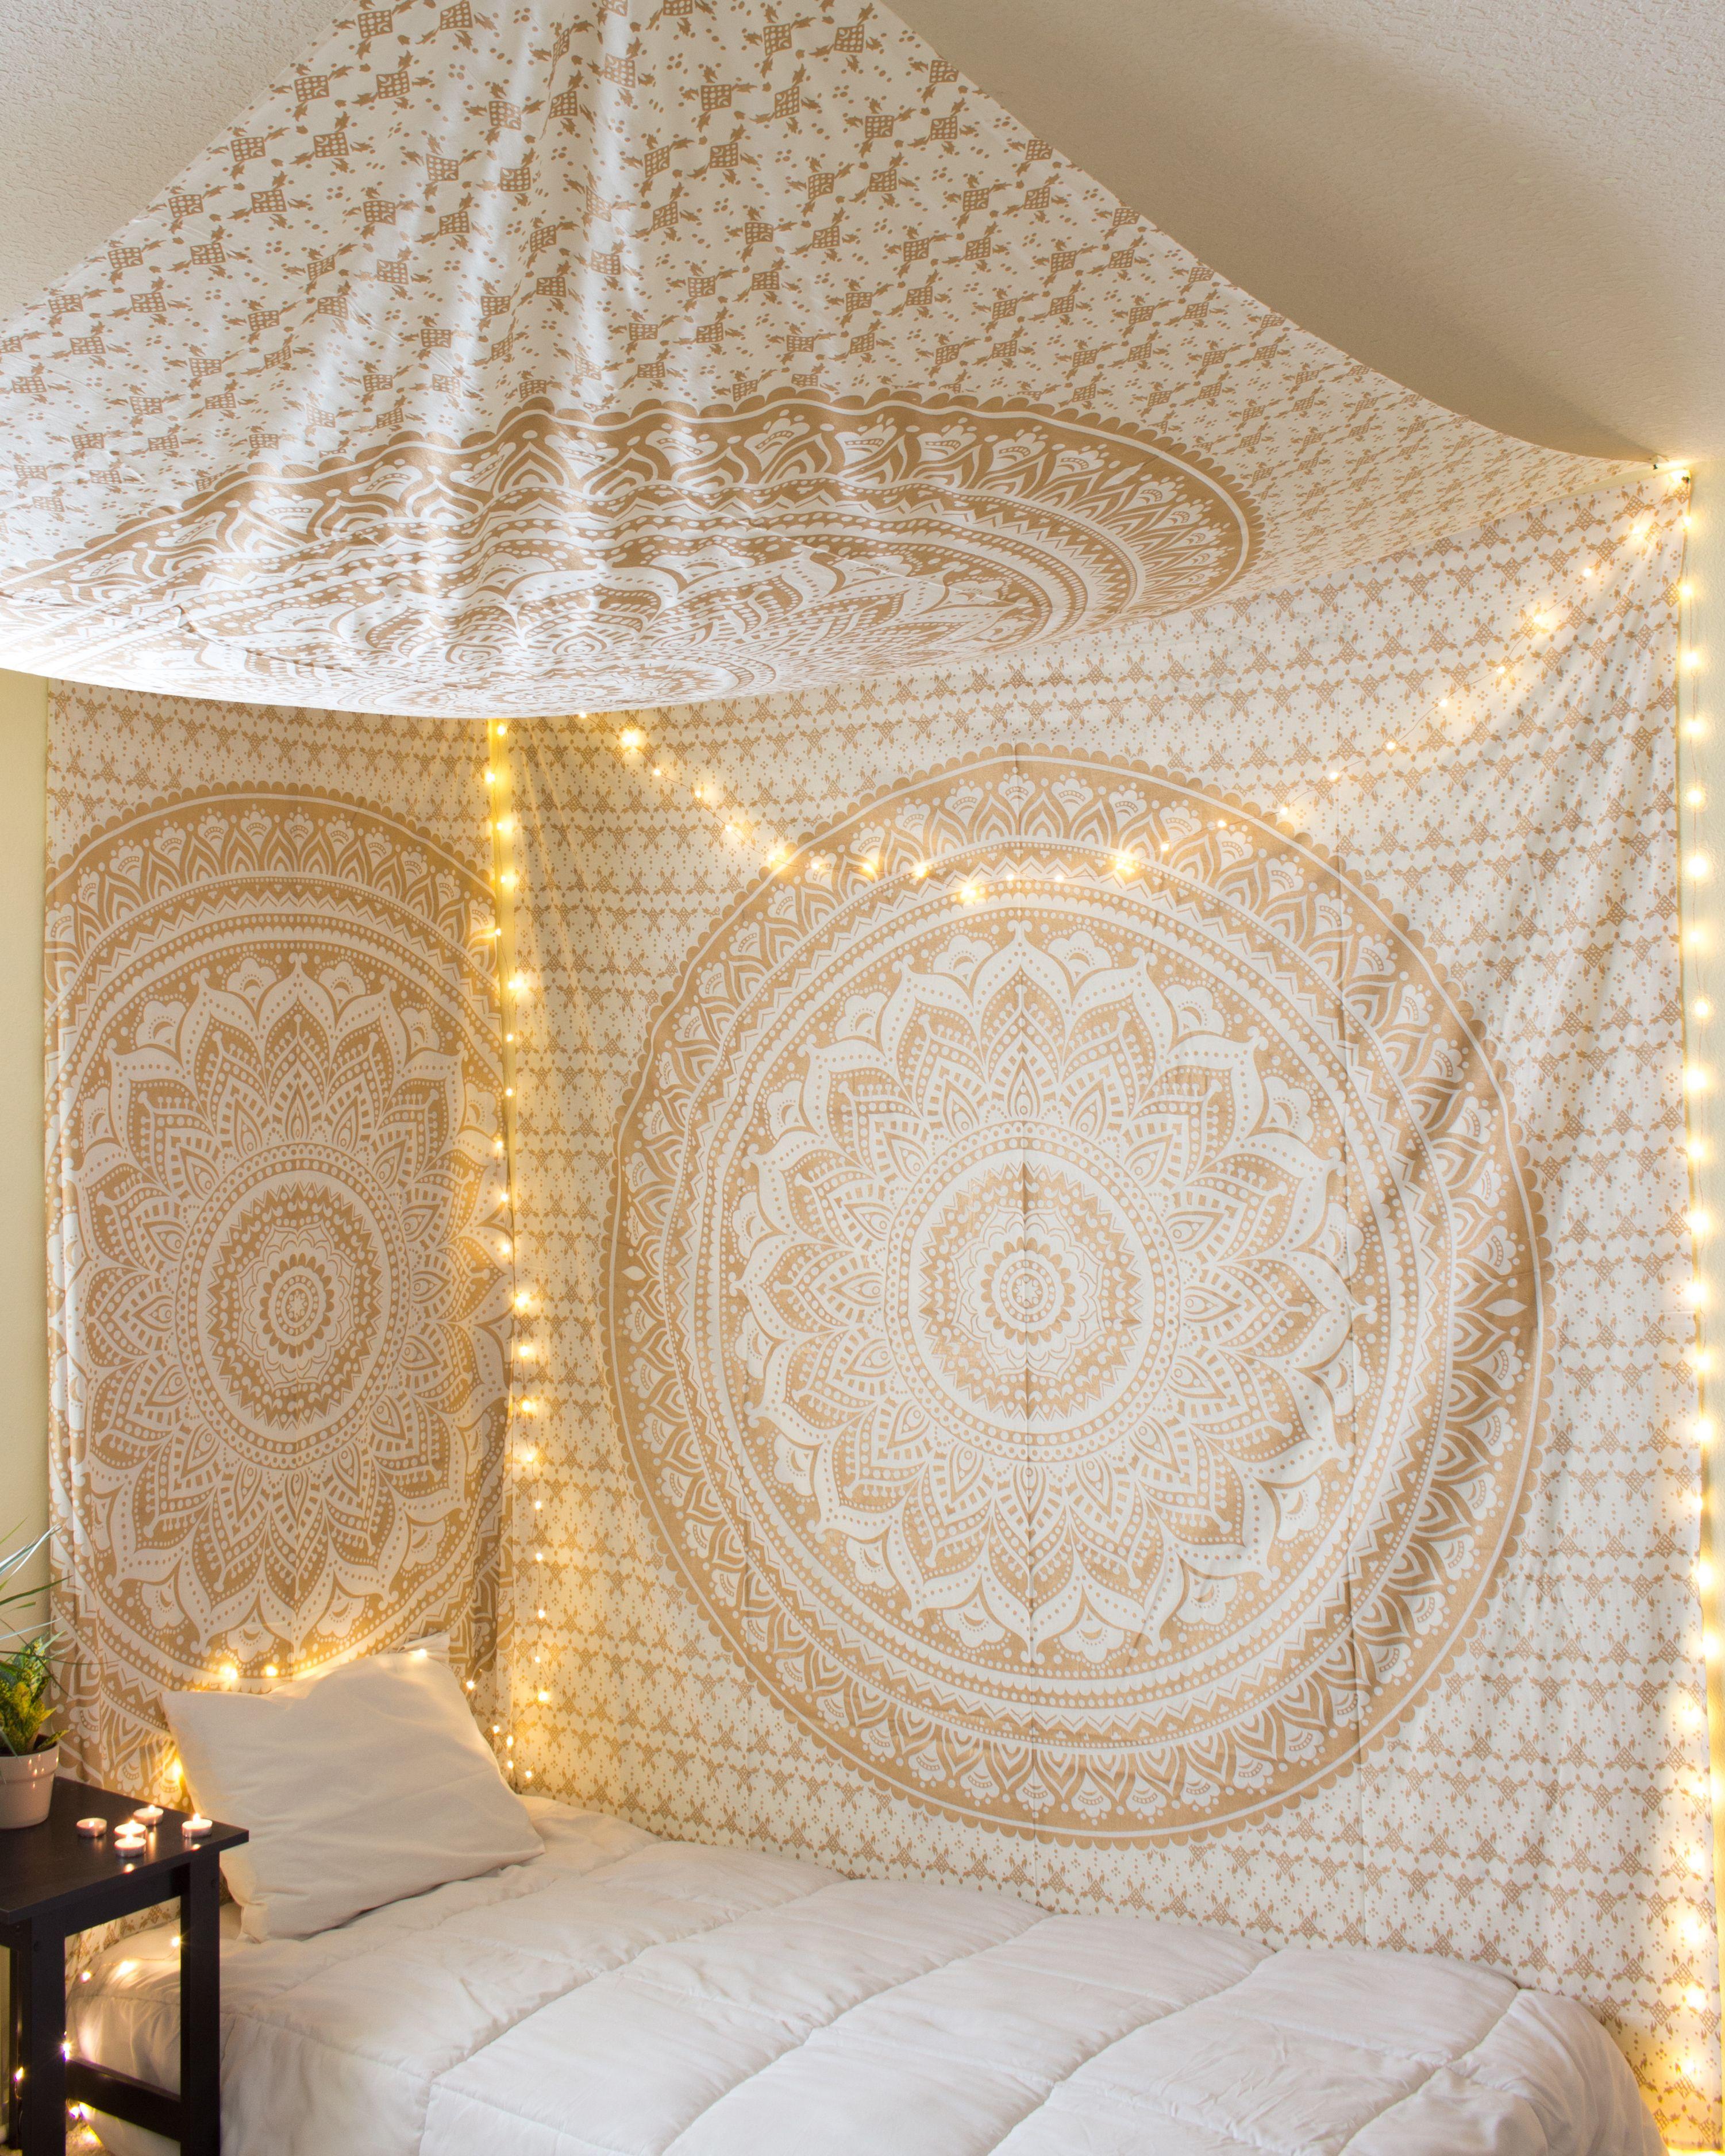 Gold Glimmer Tapestry Cute Dorm Rooms Bedroom Decor Room Decor